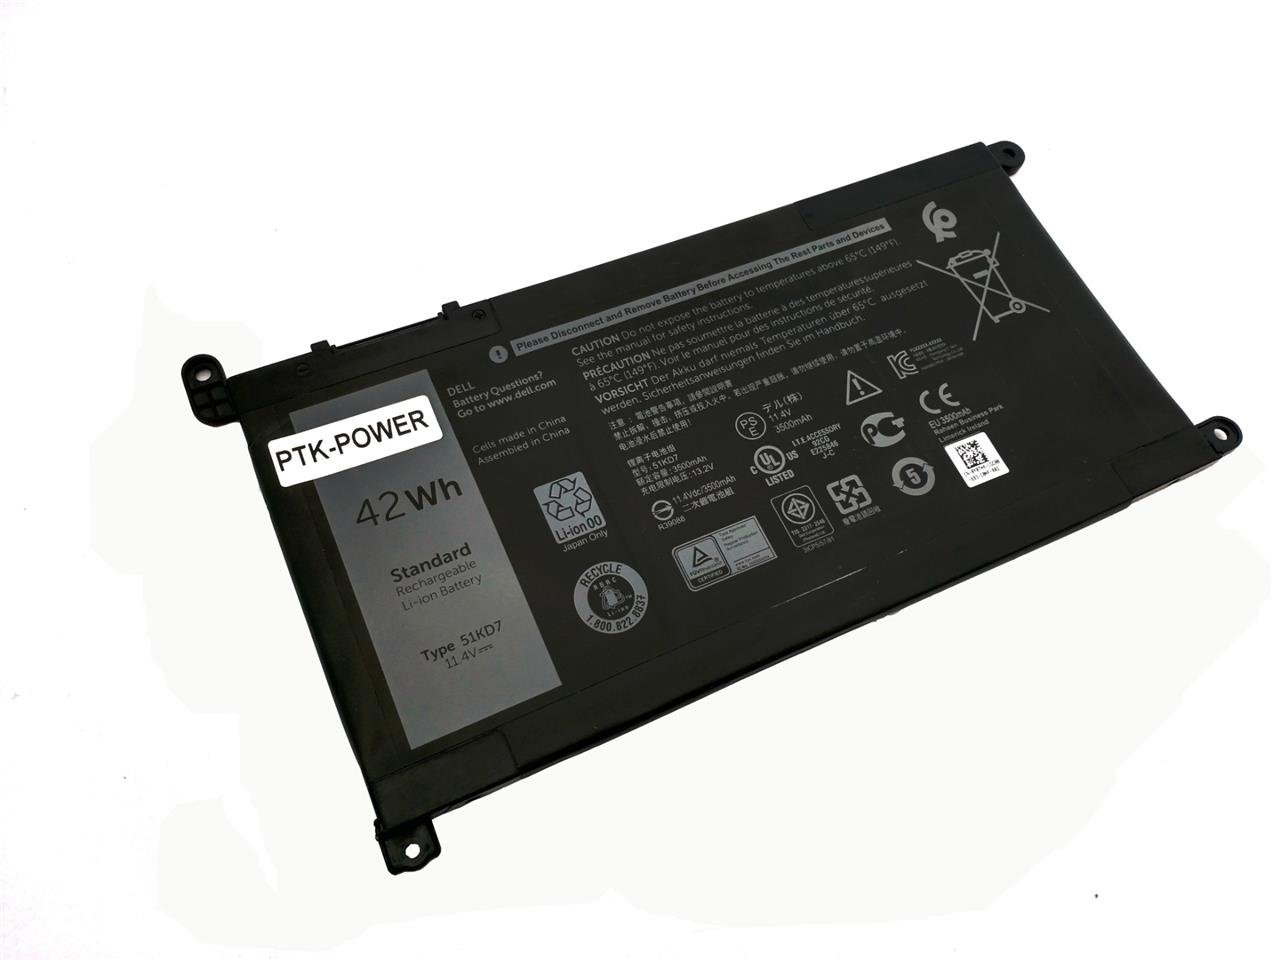 PTK-POWER 11.4V 42Wh 0Y07HK 51KD7 Notebook Battery For DELL Chromebook 11 3180 3189 Laptop batteries